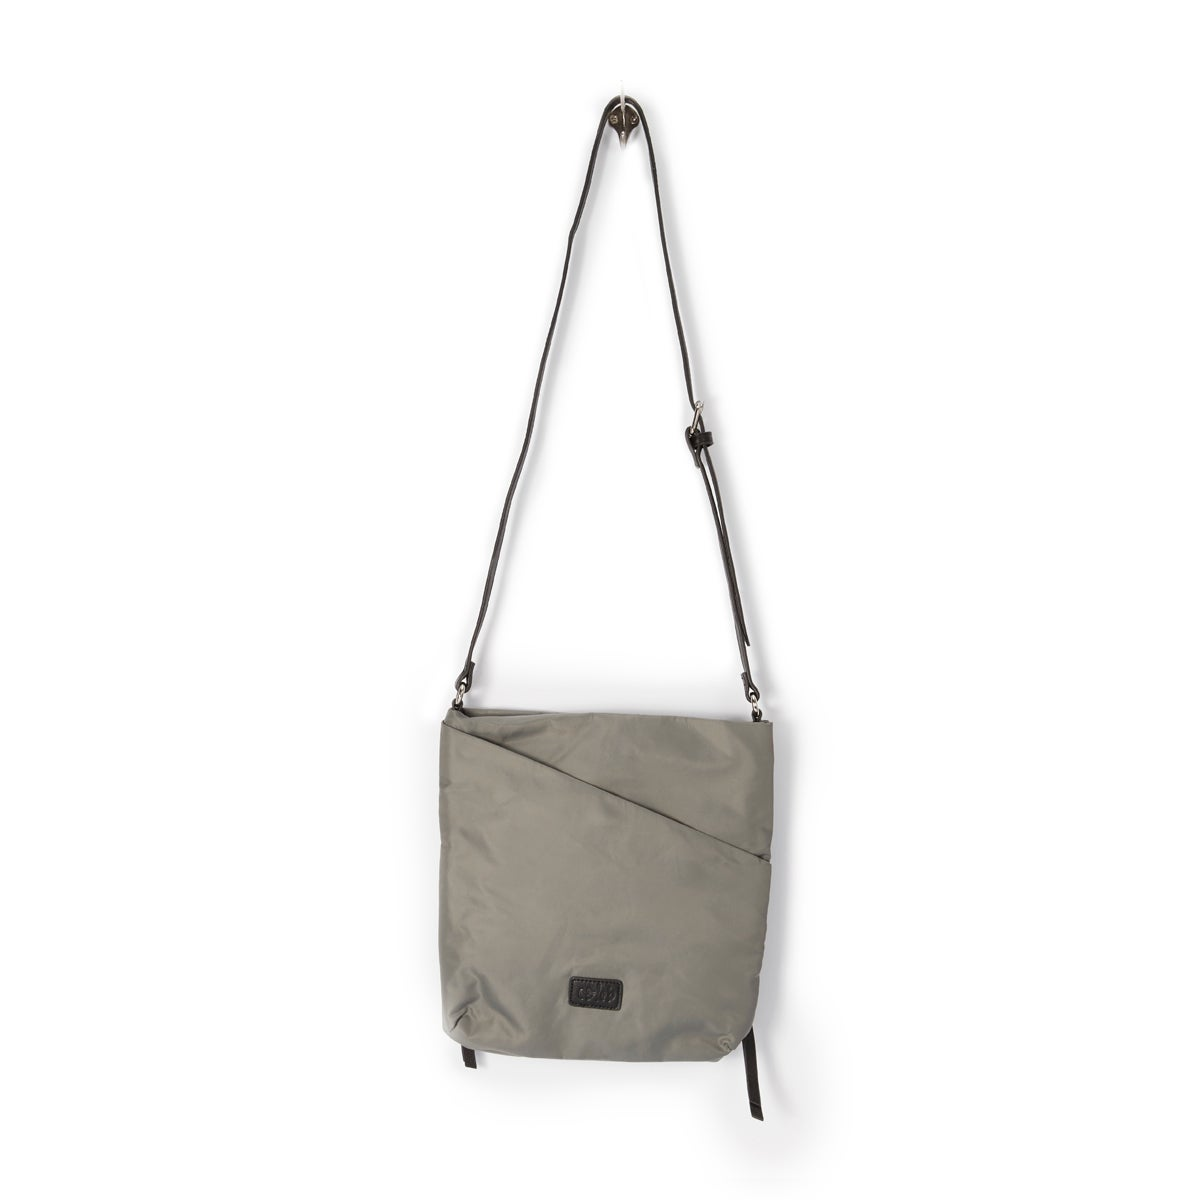 Lds Chelsea lt grey cross body bag